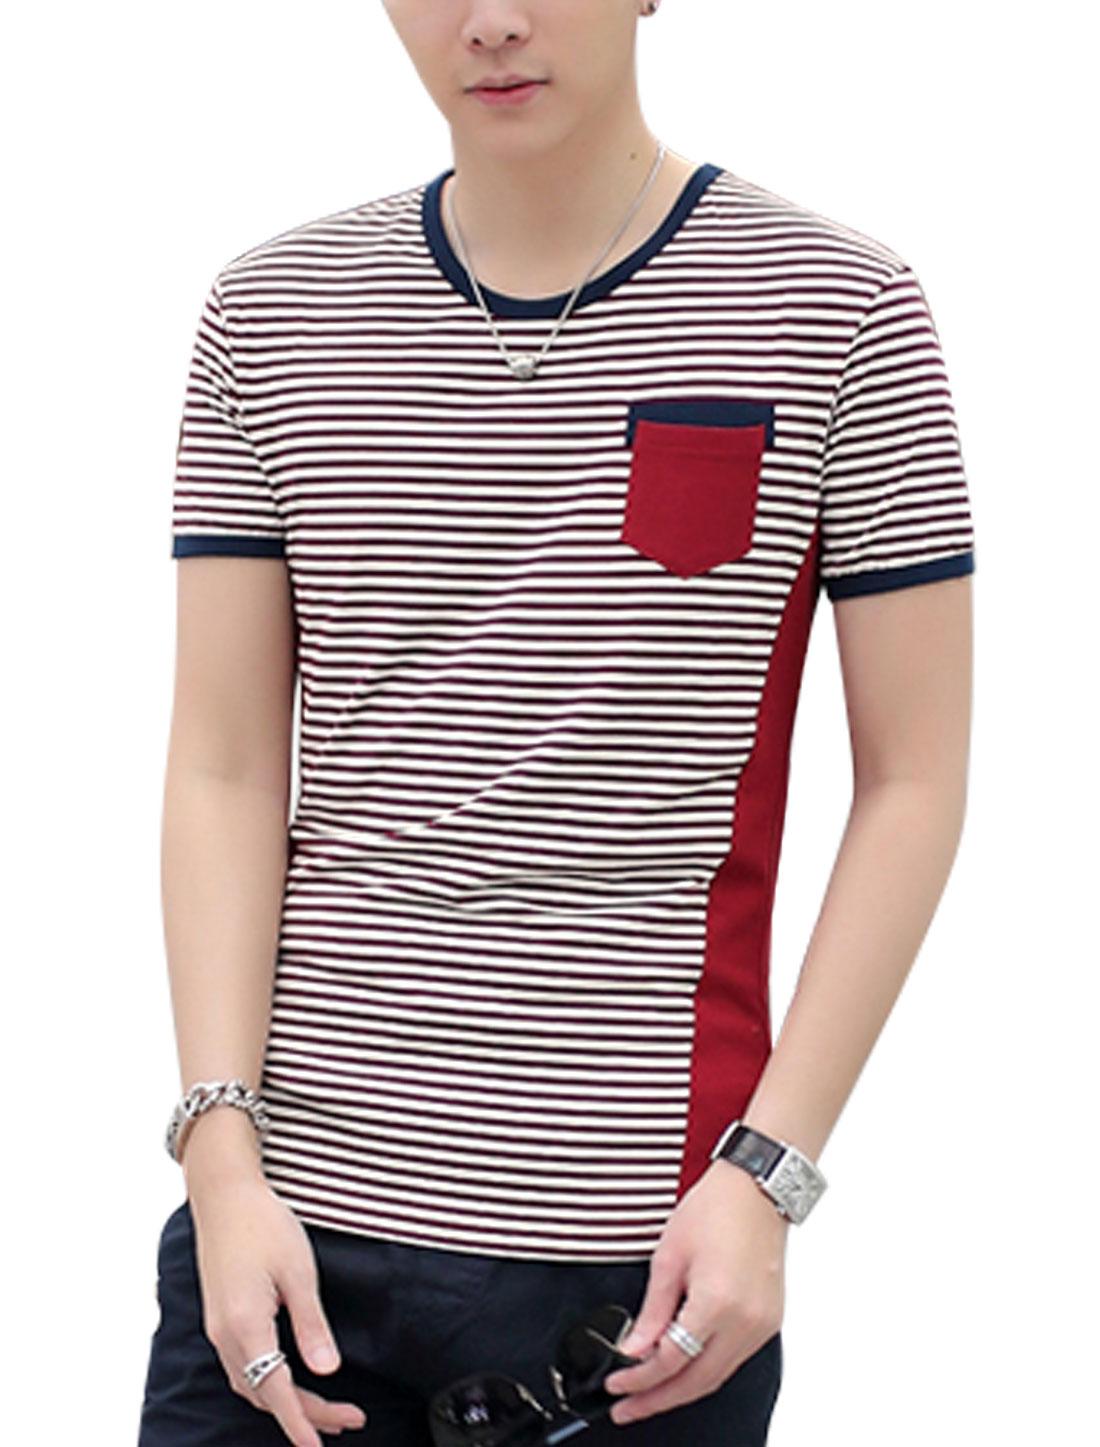 Man Stripes Round Neck Short Sleeves Chest Pocket Piped Tee Burgundy Beige M